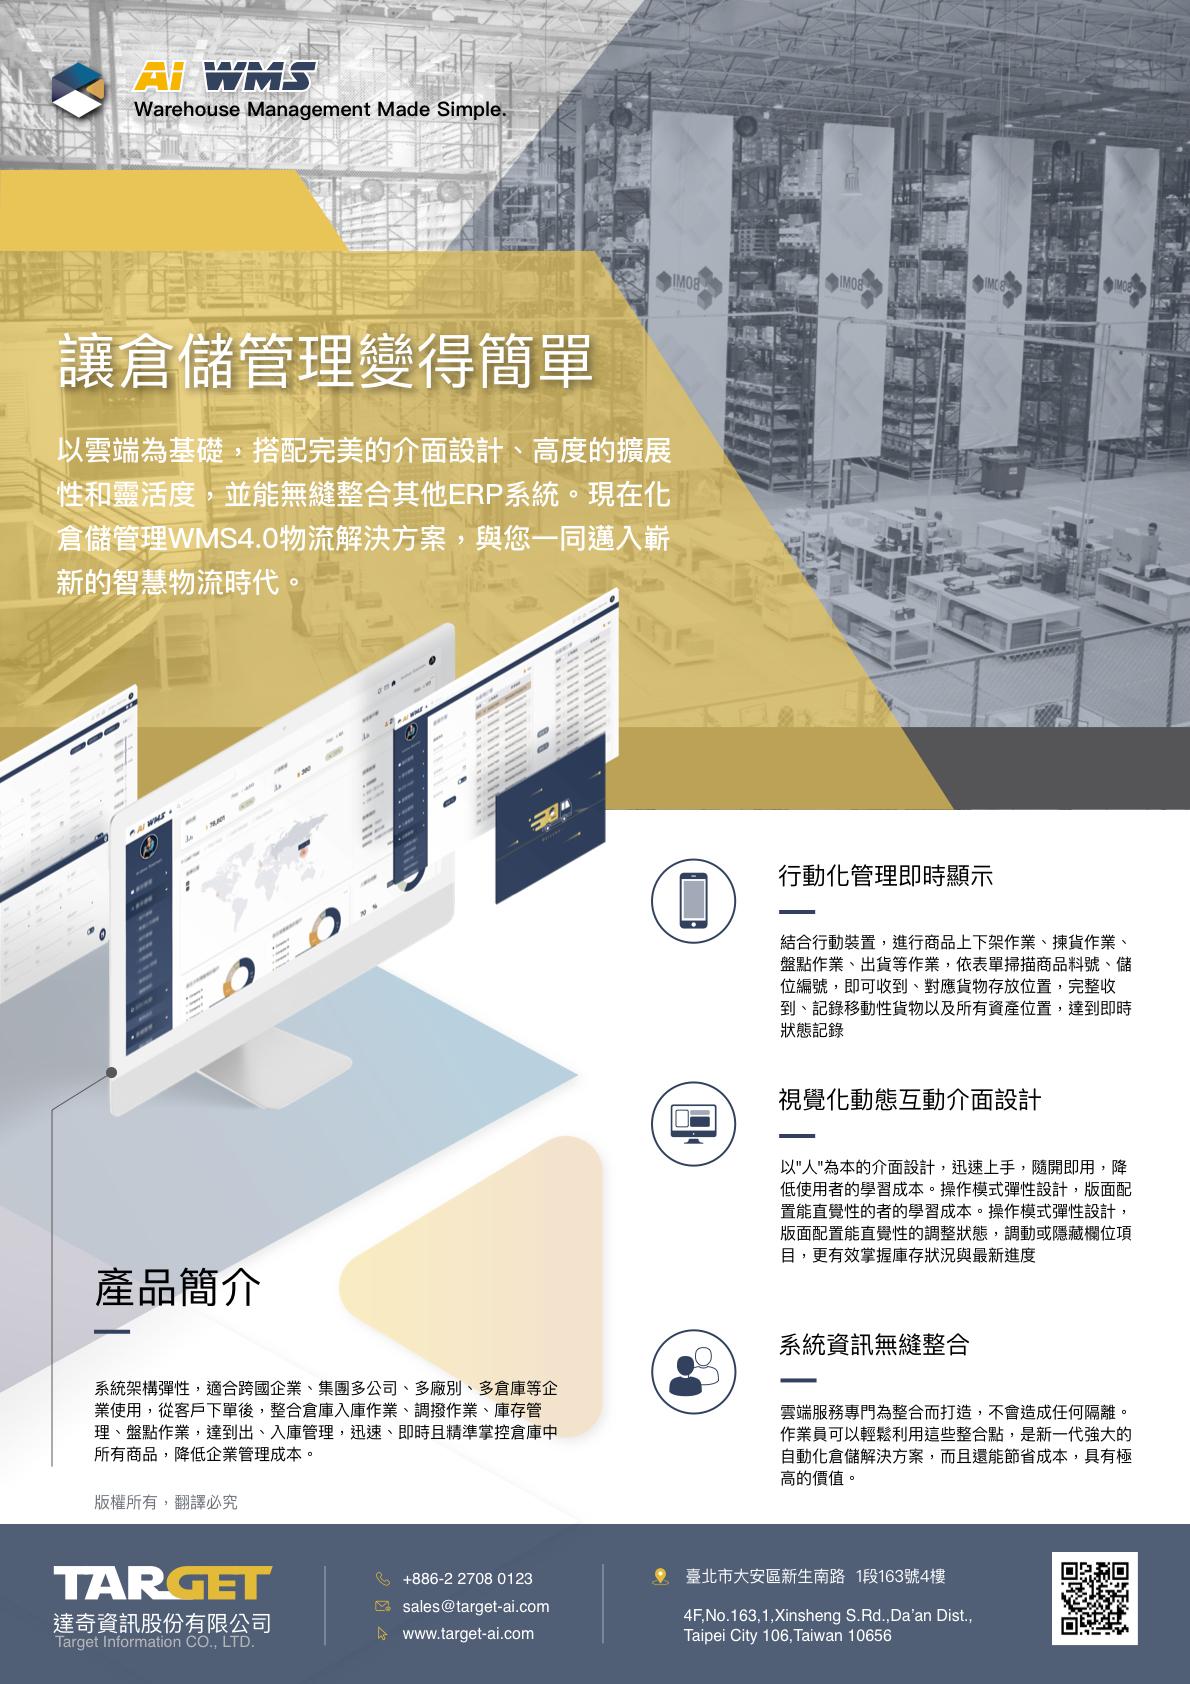 WMS-倉儲系統